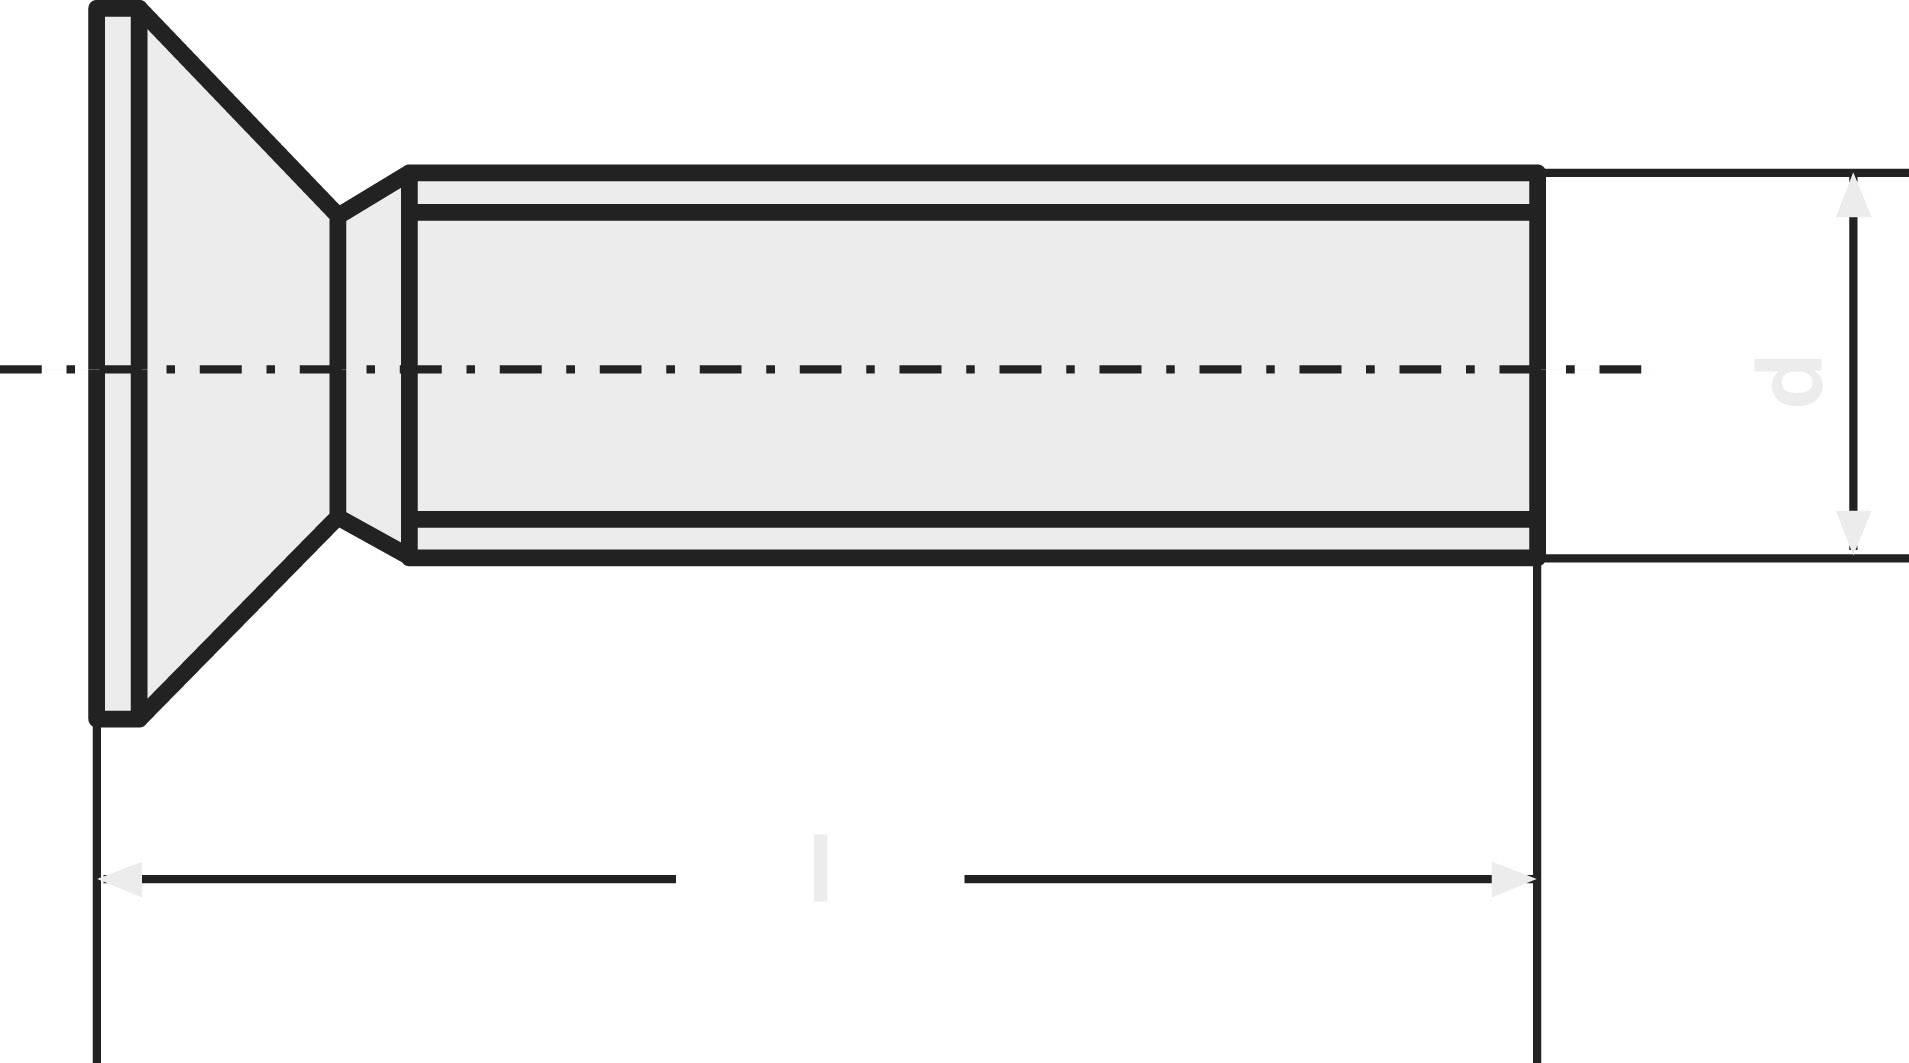 Zápustný šroub TOOLCRAFT 839906, Torx, M2, DIN 965, 5 mm, ušlechtilá ocel, 20 ks